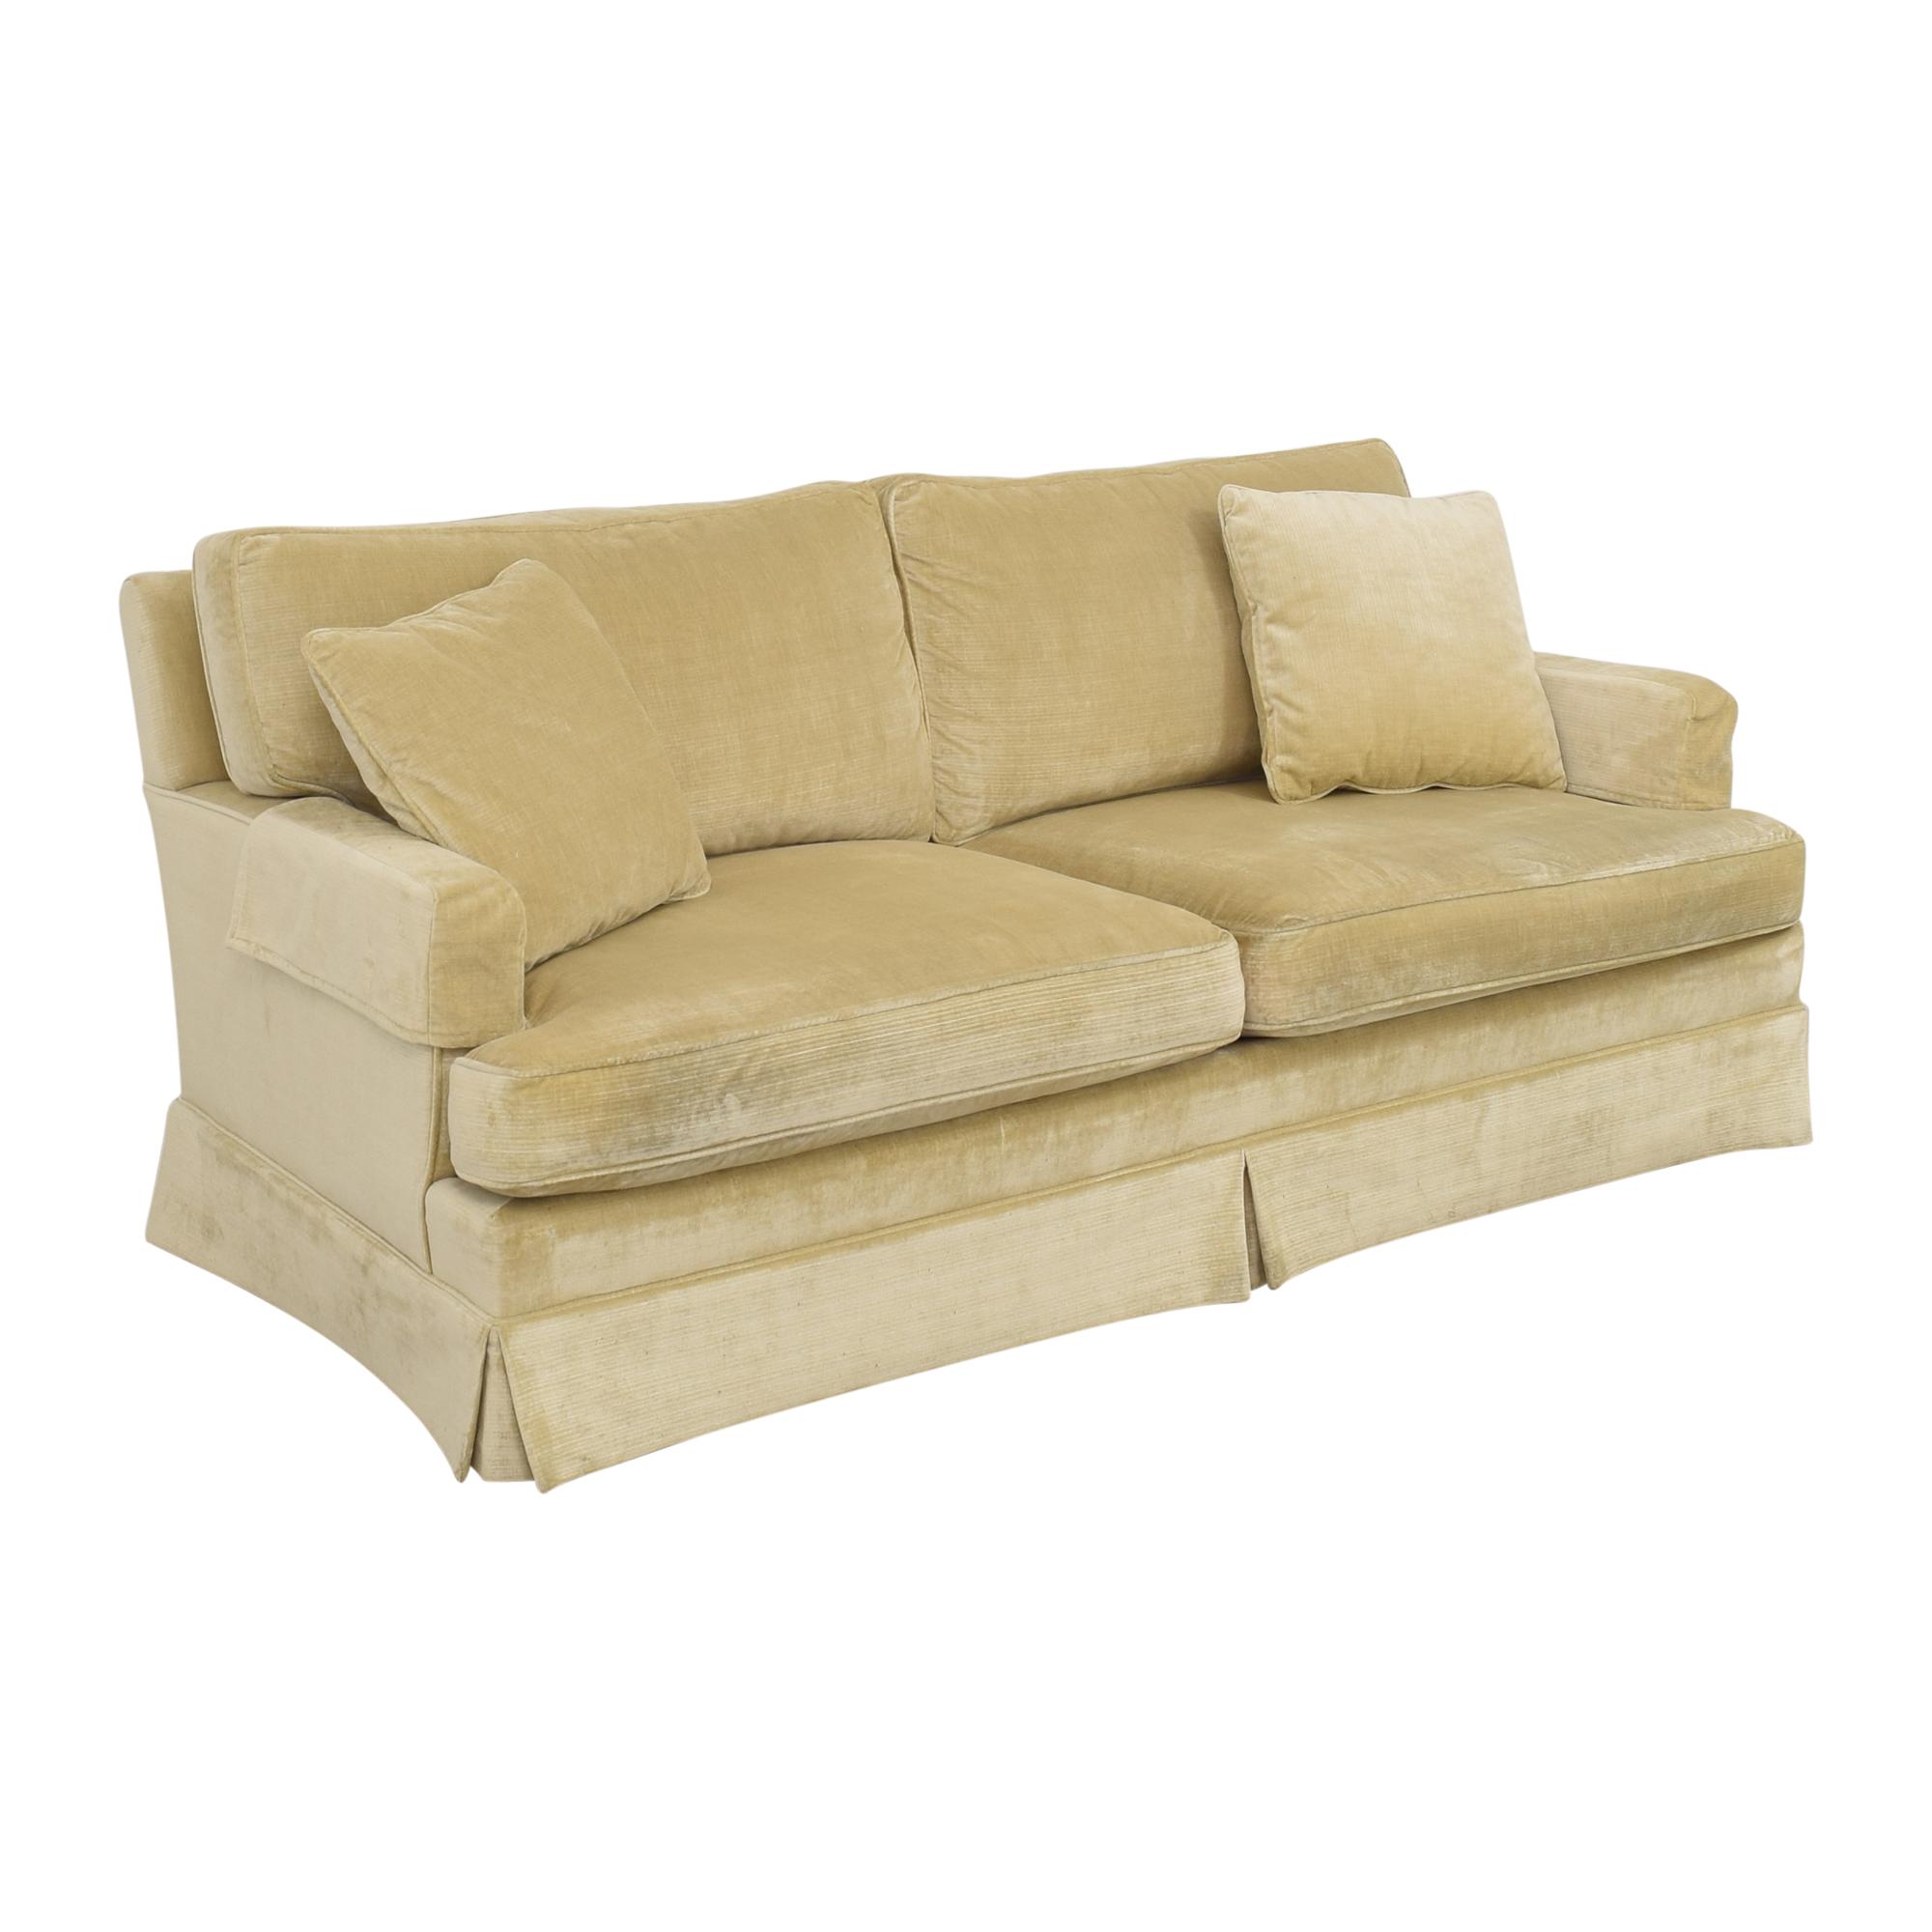 Lee Industries Apartment Sofa / Sofas